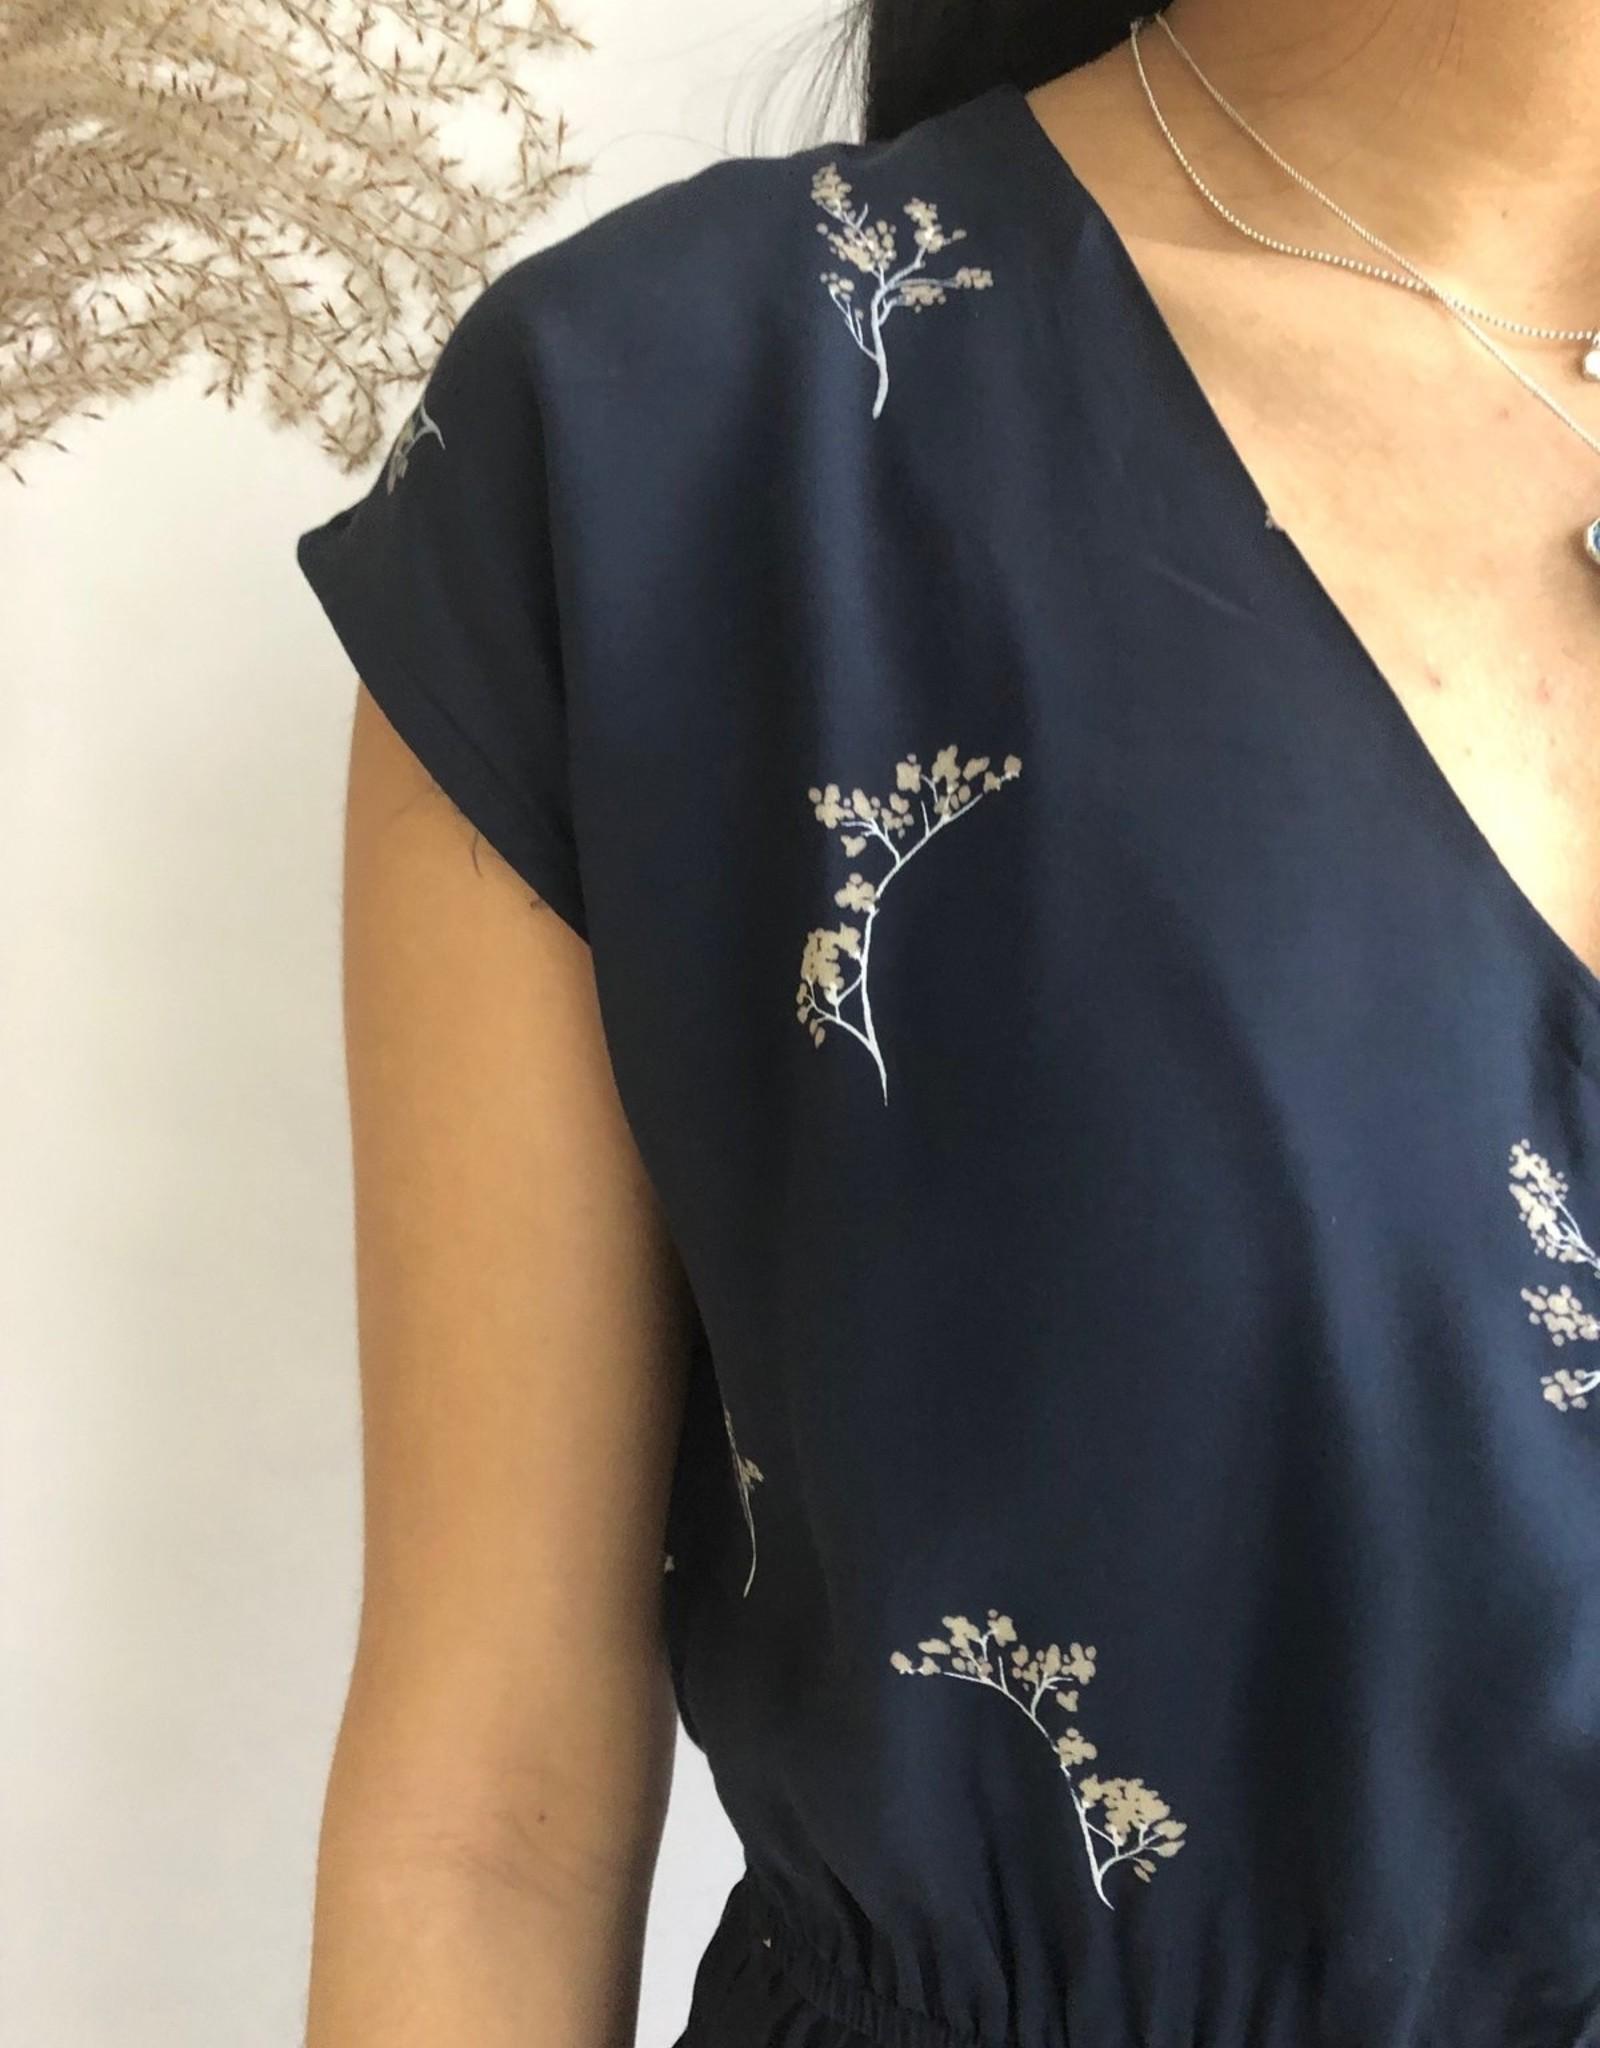 MINIMUM MINIMUM Numine Dress